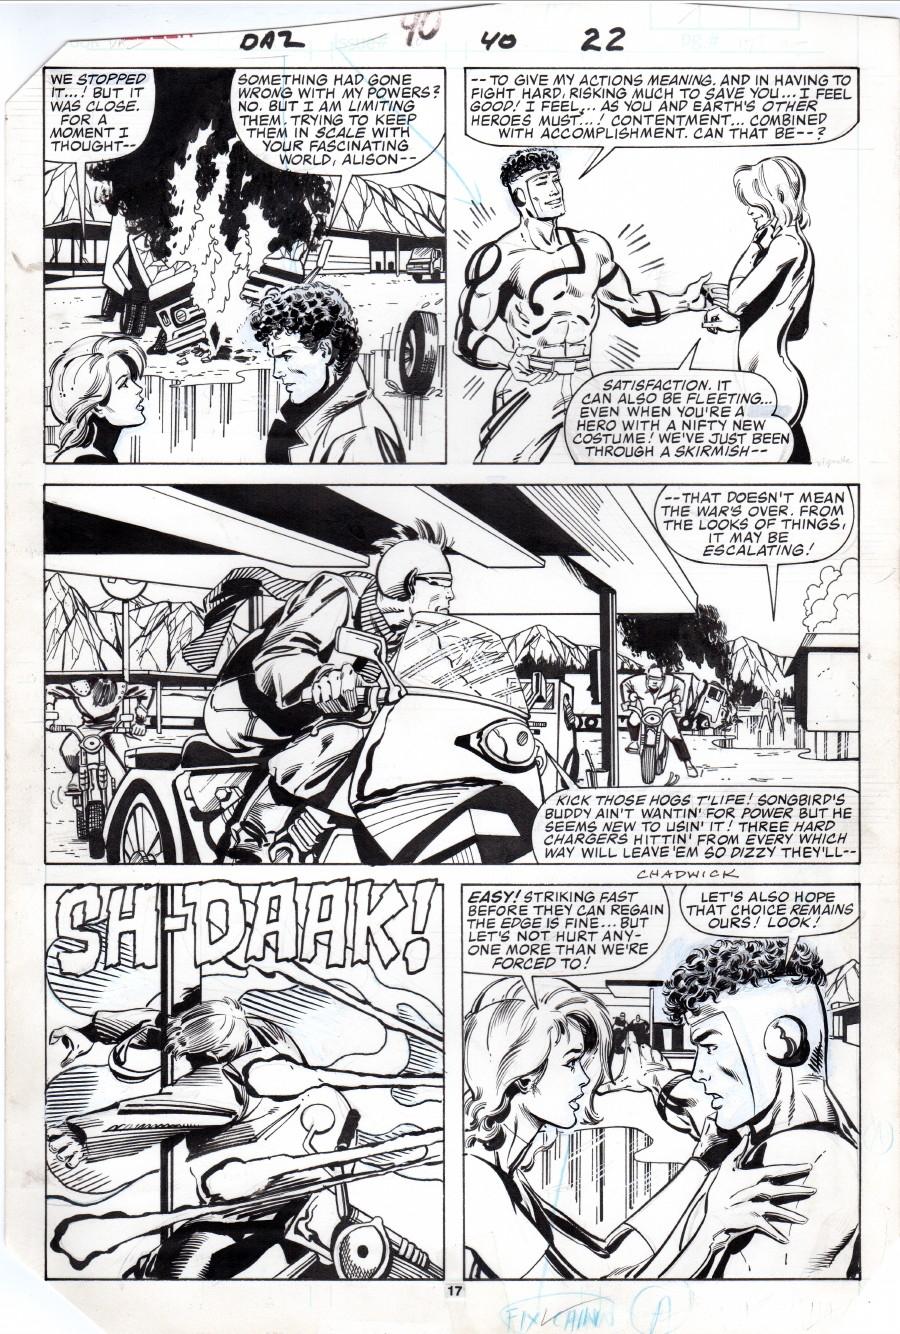 Dazzler 40, page 17, in Lee Benaka's Dazzler 38-42 (Paul